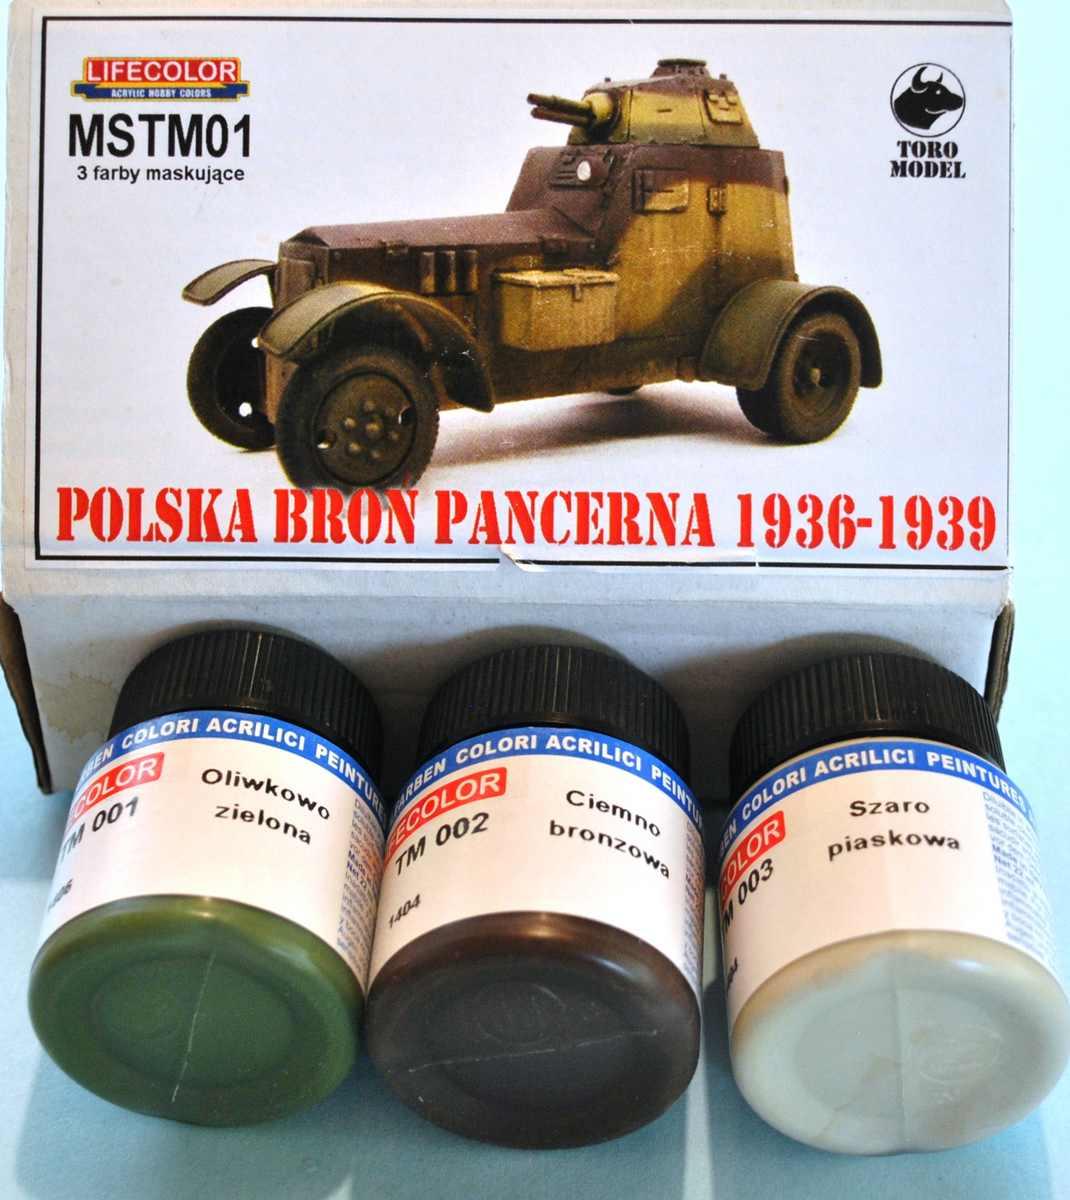 Life-Color-Farben-polnische-Armee-1939-4 Farben polnische Armee 1939 von Life Color